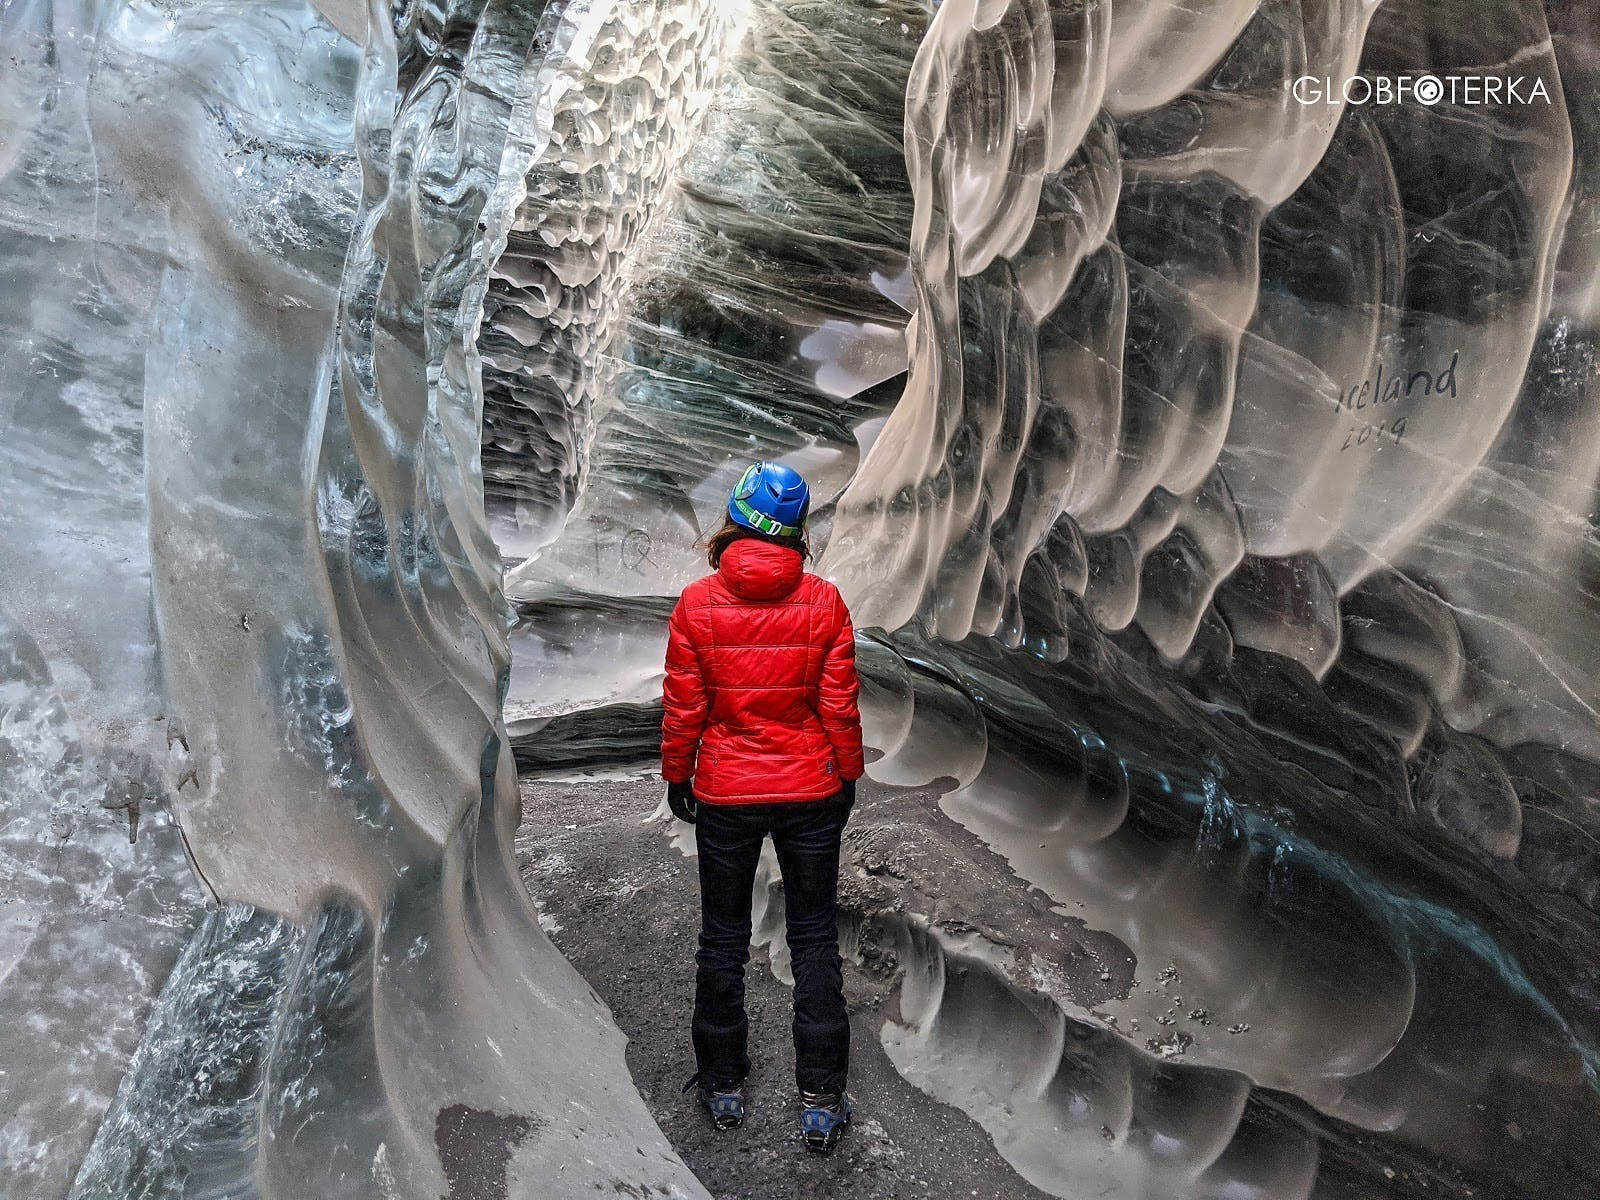 piekno-lodu-vatnajoekull-i-lodowcowe-jaskinie-1.jpg